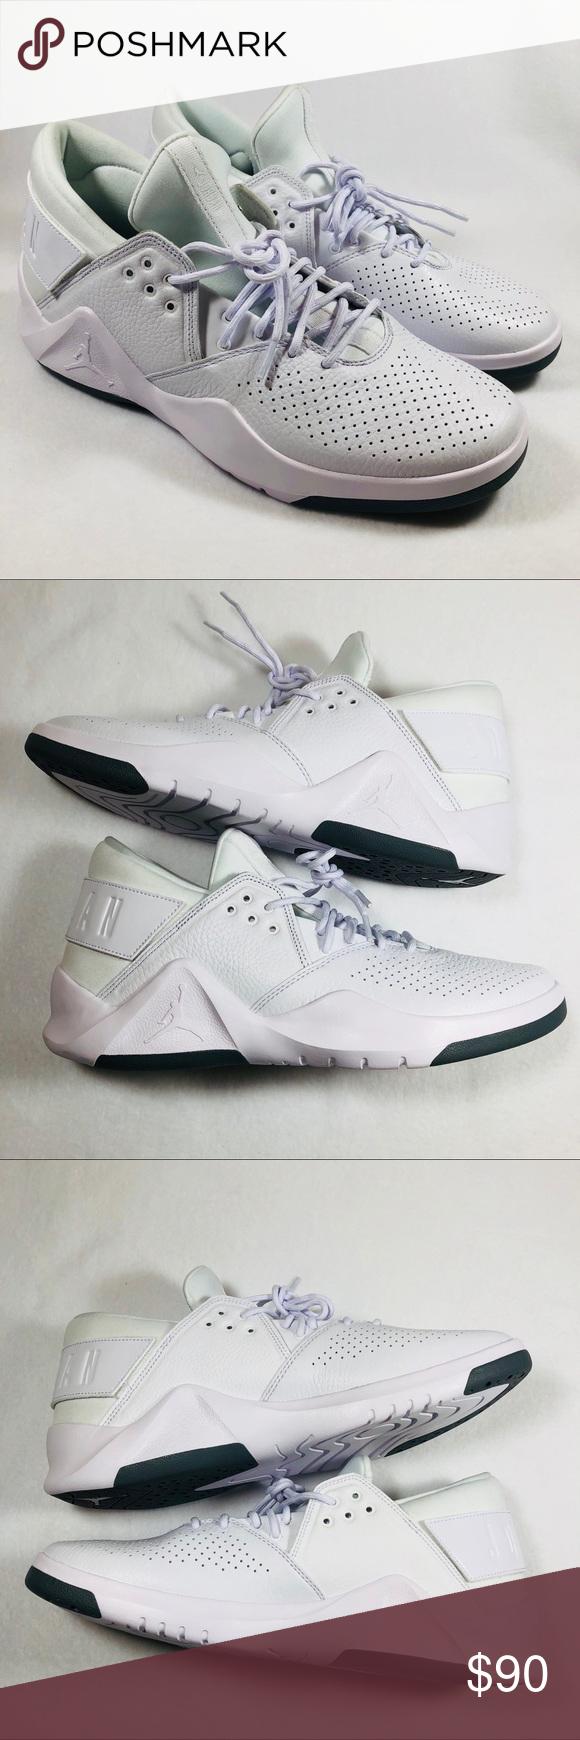 7413afc5f2b Nike Jordan Flight Fresh Premium Men's Shoes Sz 12 Brand New Without Box Nike  Jordan Flight Fresh PREM Premium Men's Basketball Shoes Sz 12 (AH6462-100),  ...